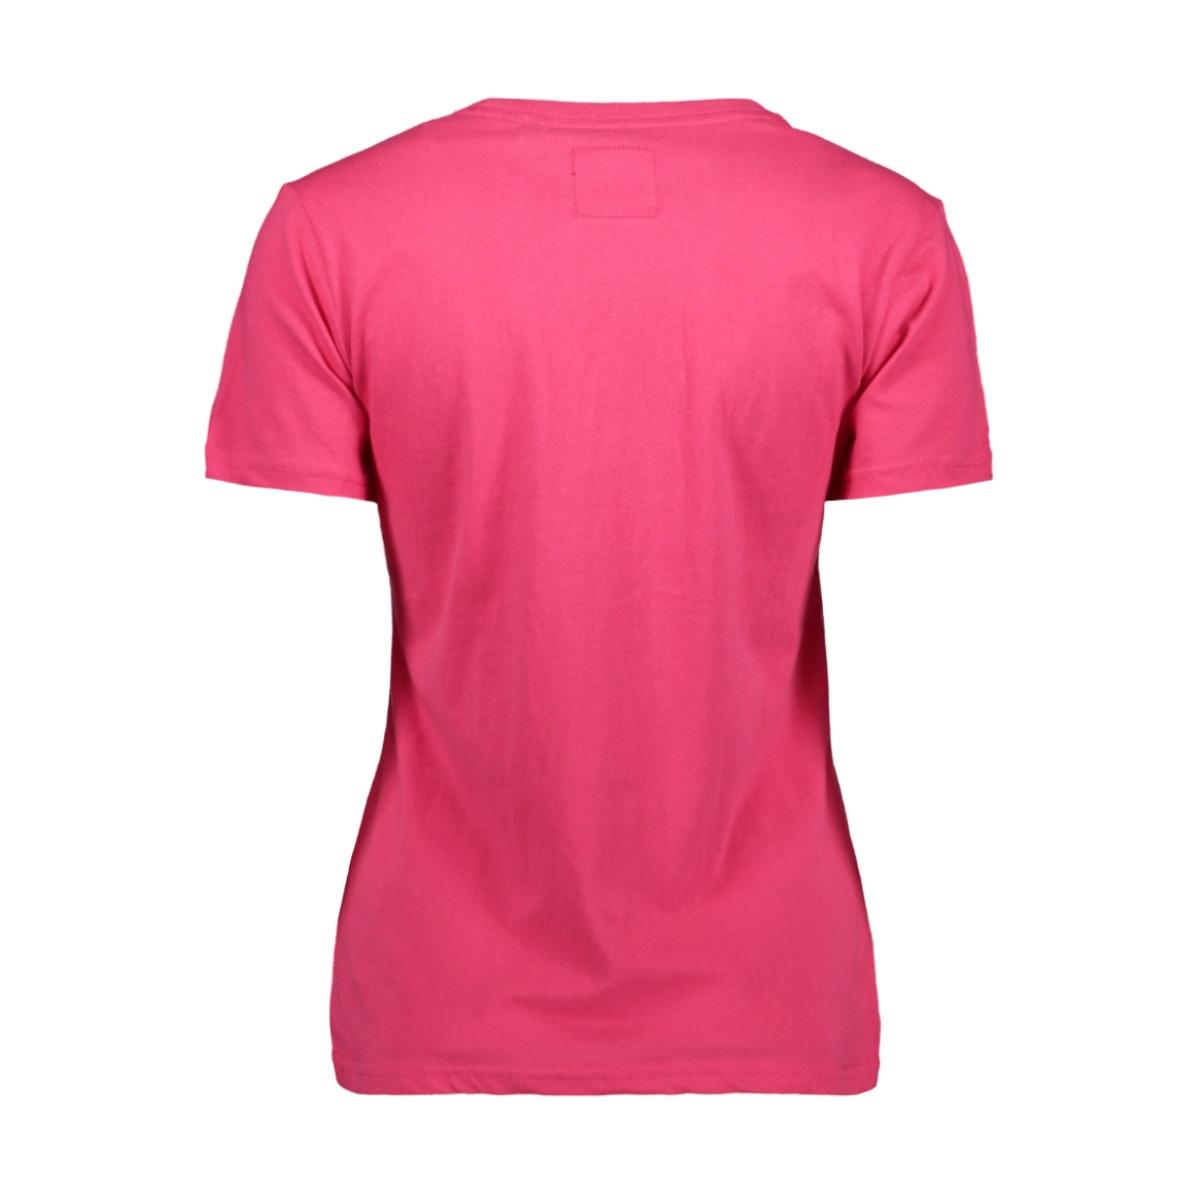 vl tonal entry tee w1010028a superdry t-shirt magenta